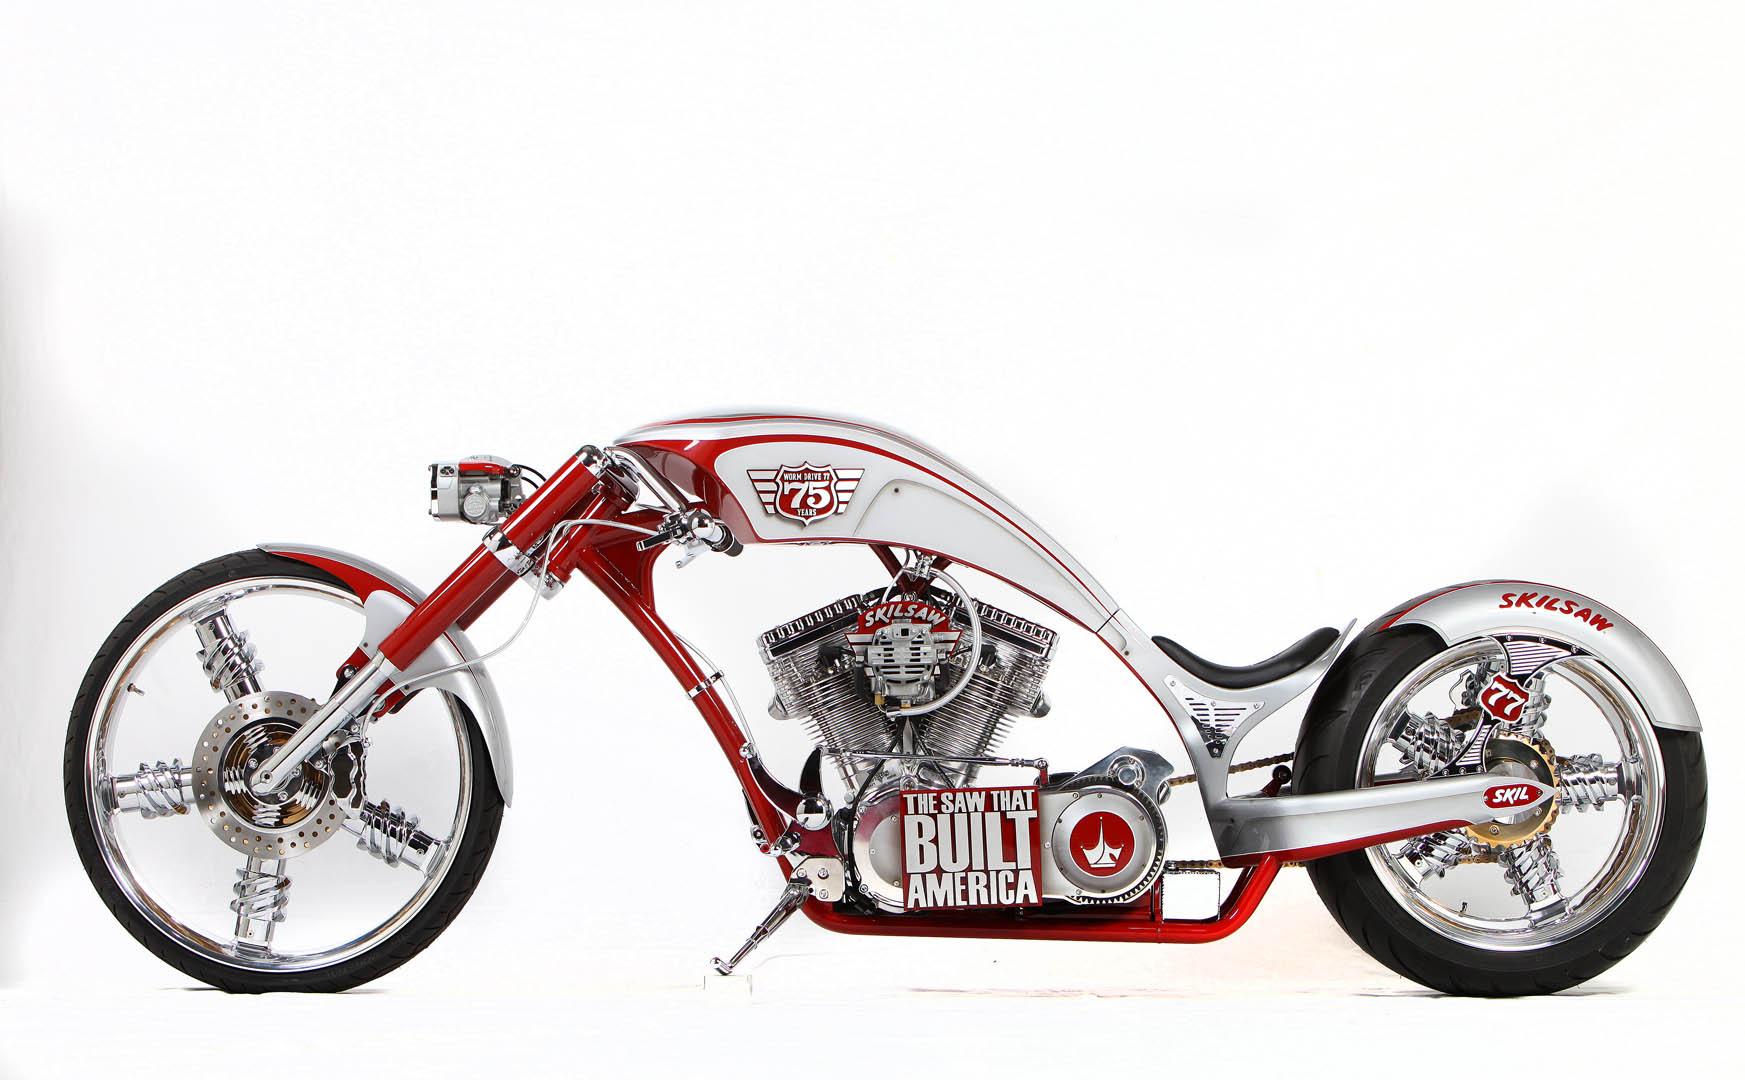 paul-jr-designs-skil-bike-018